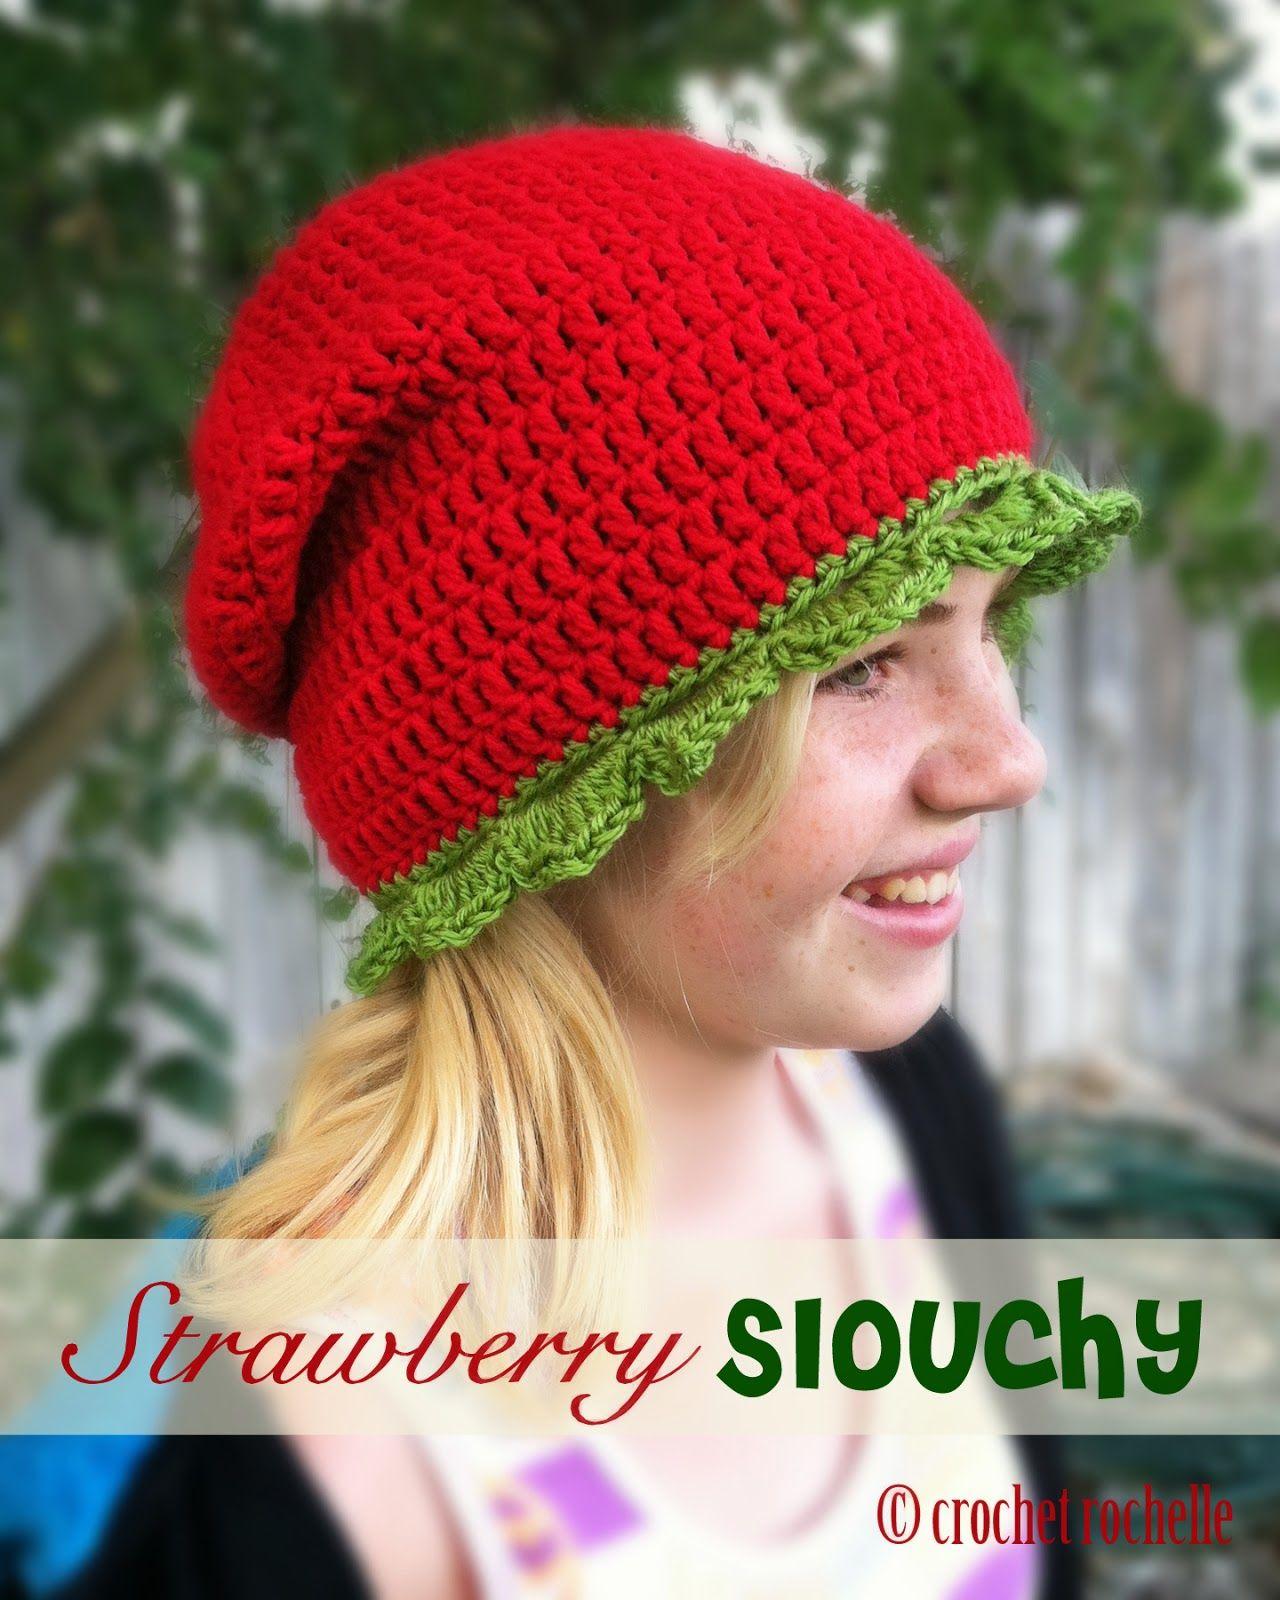 Crochet Rochelle: Strawberry Slouchy | Making things | Pinterest